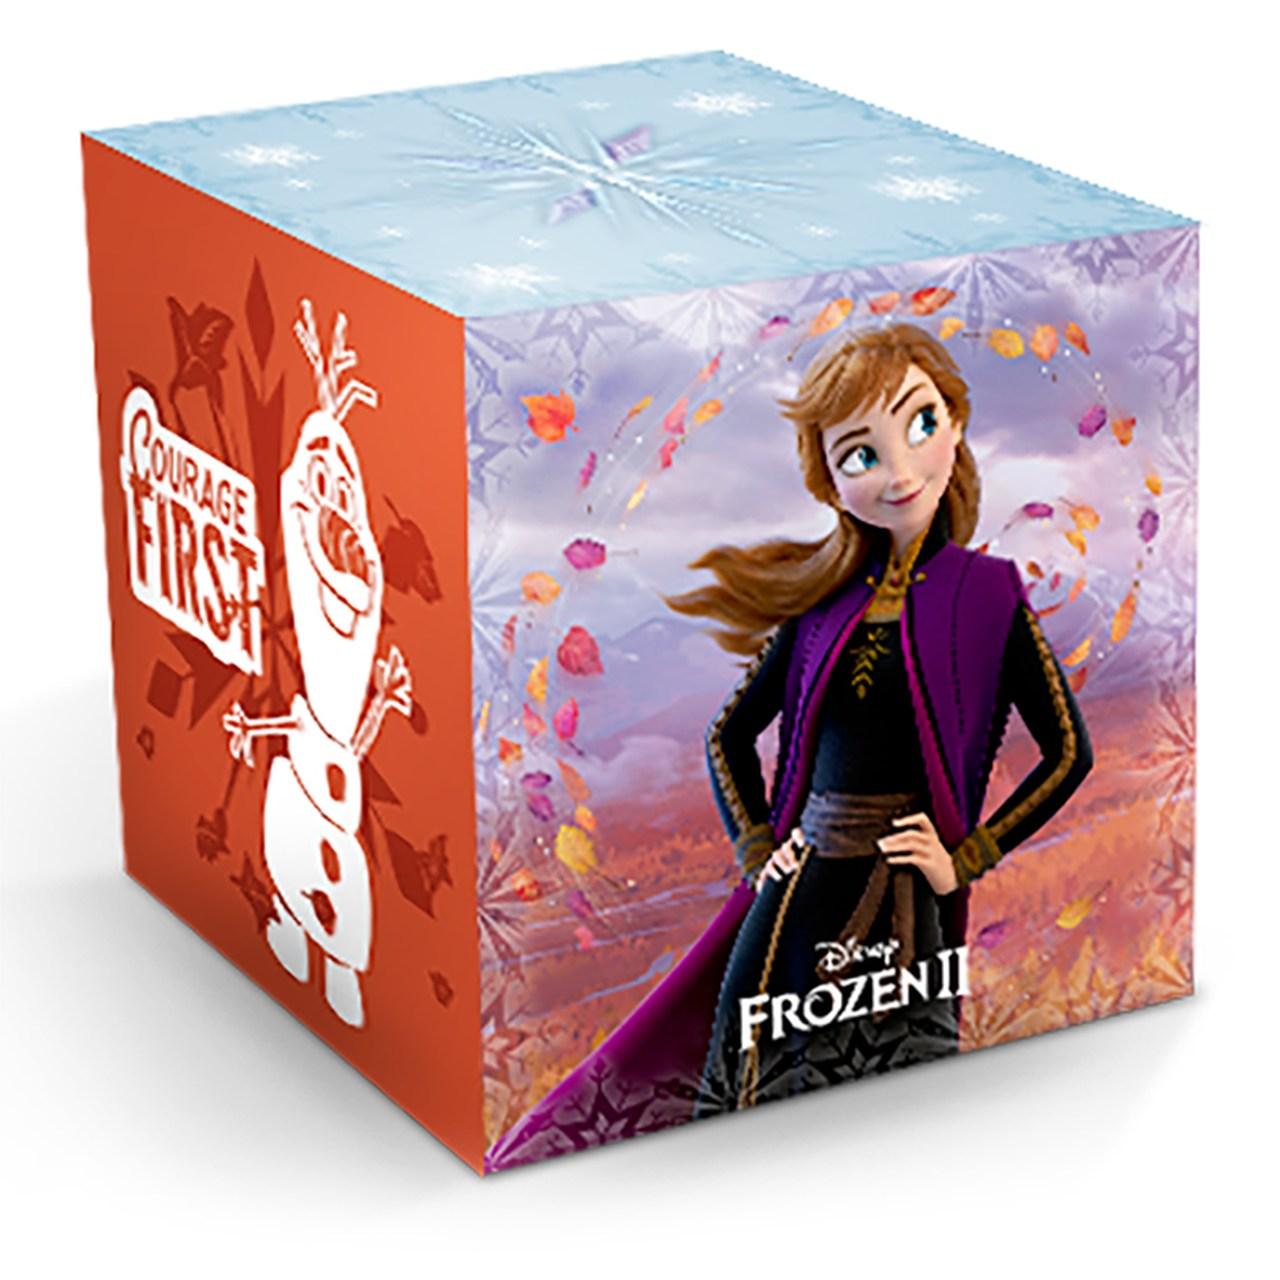 Cubo Decorativo Frozen